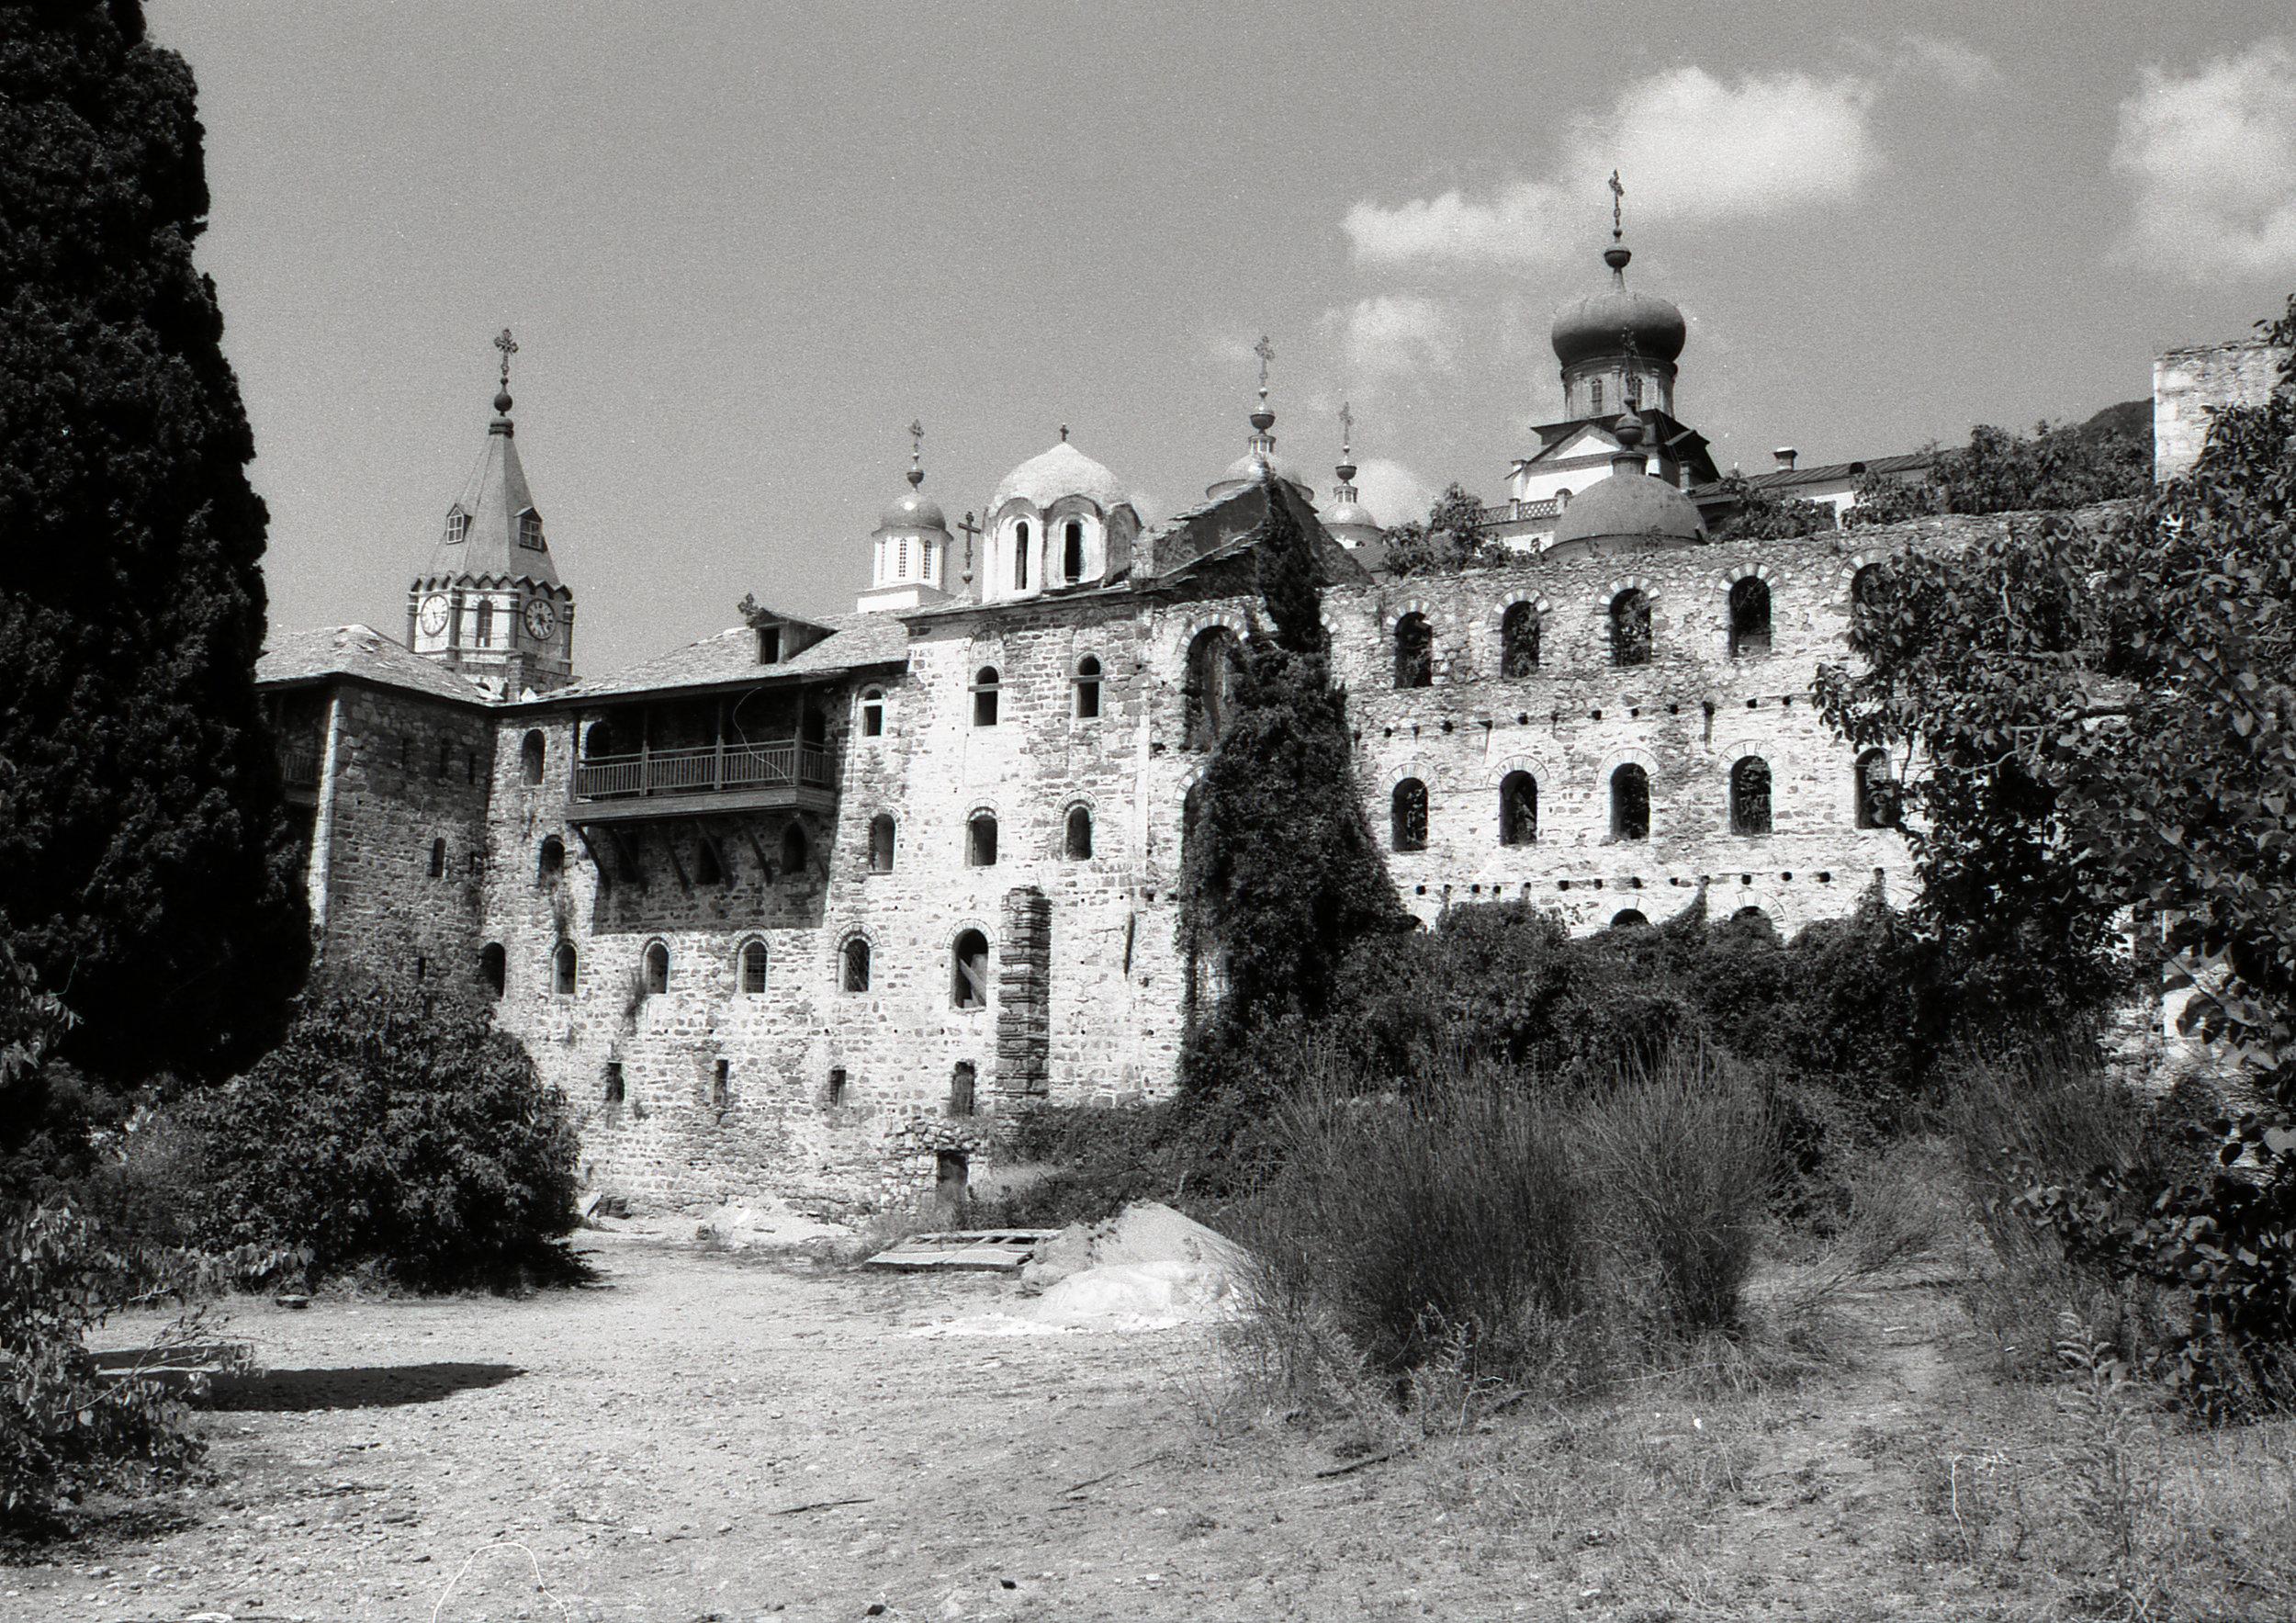 A monastary on Mt Athos, Greece